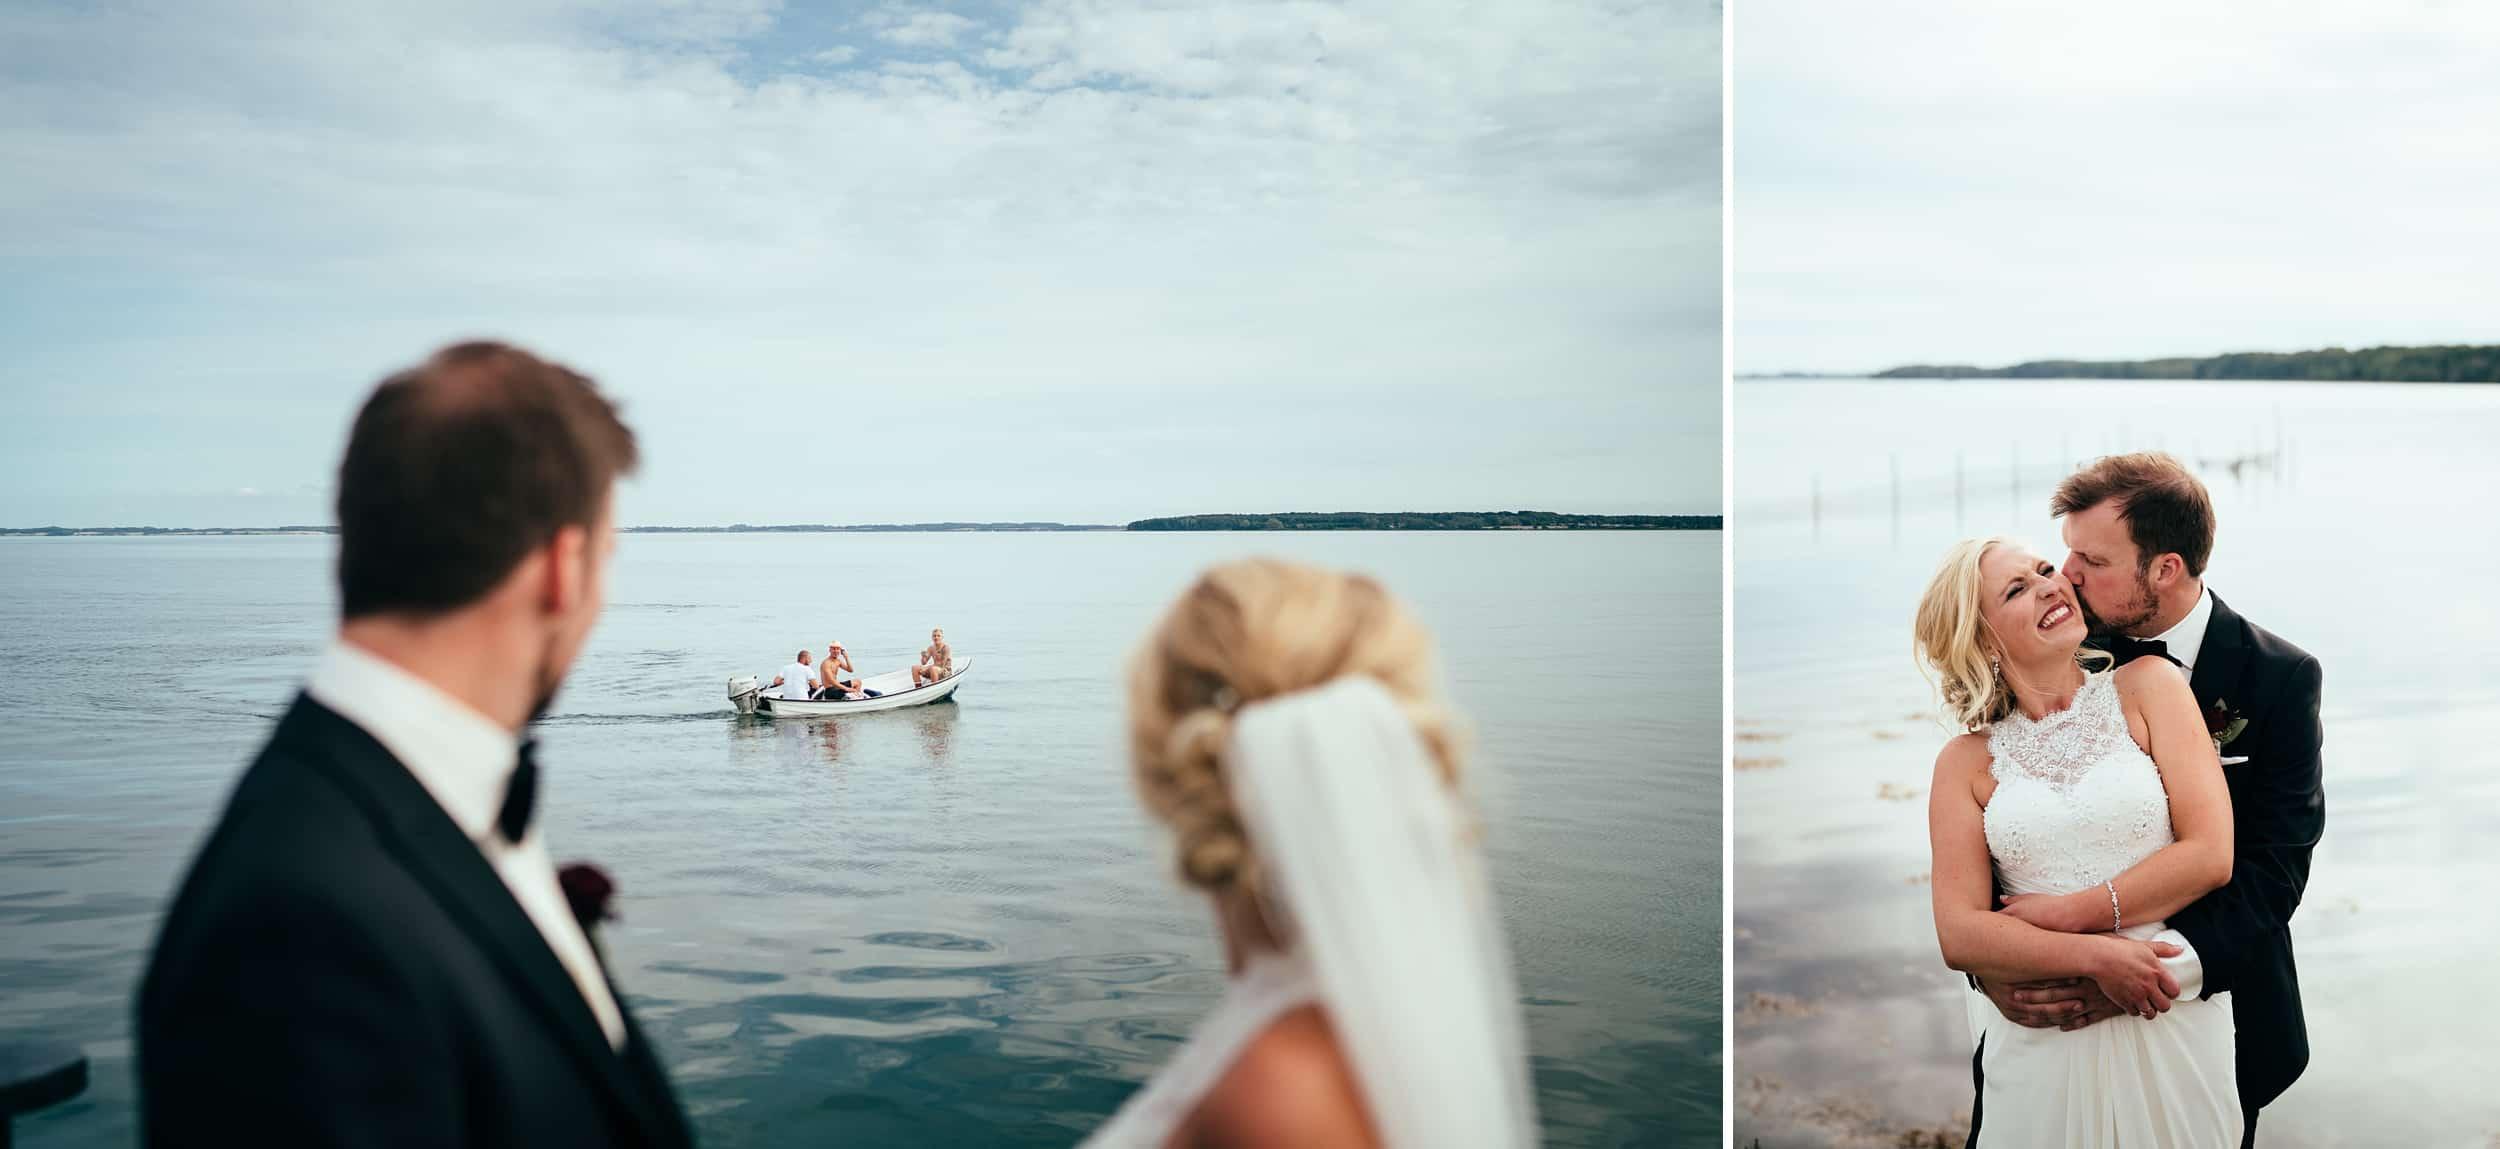 brudepar-ved-vandet.jpg